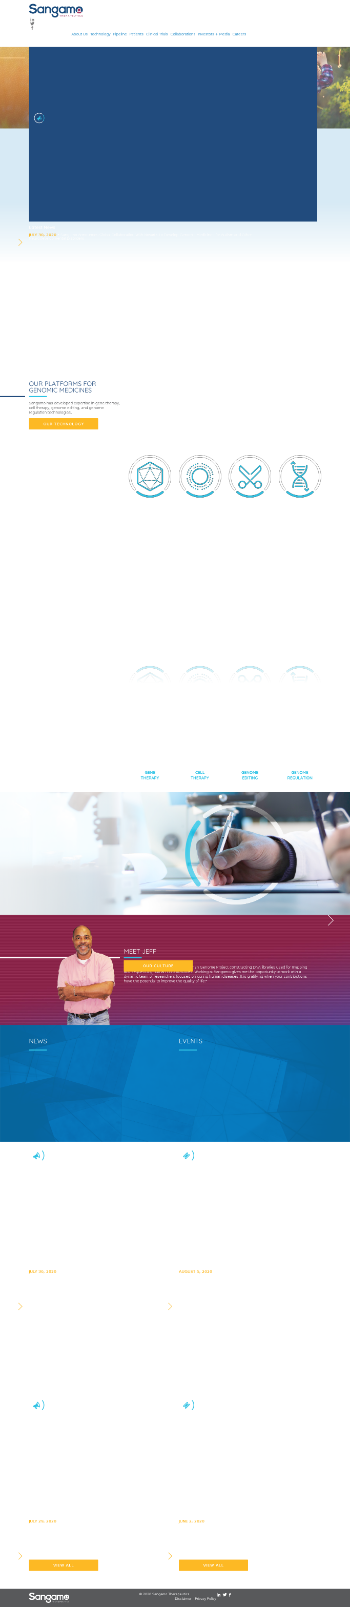 Sangamo Therapeutics, Inc. Website Screenshot